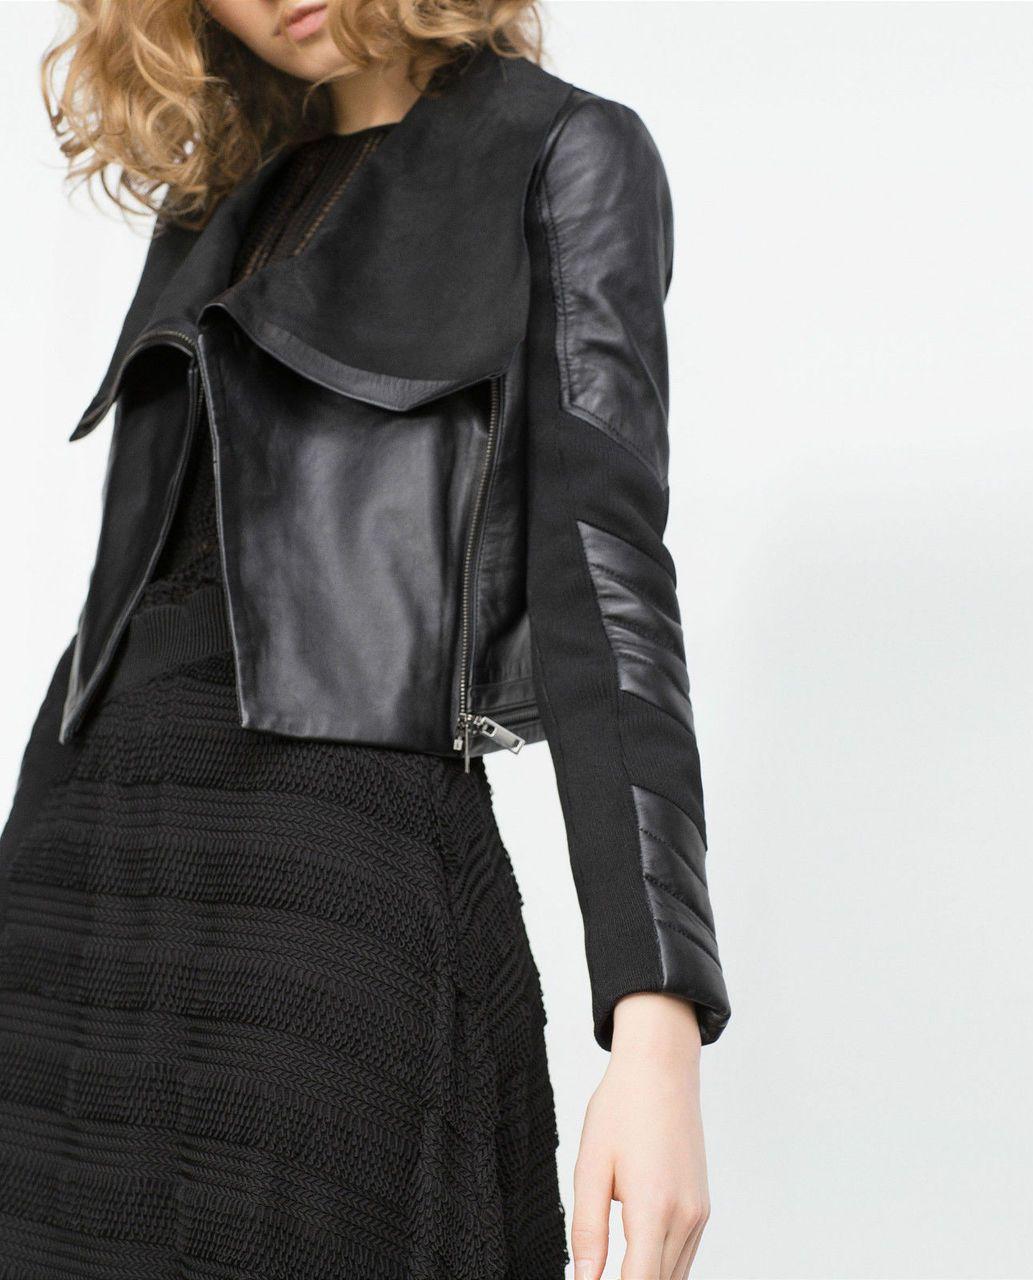 Zara Black Leather Biker Jacket Beautiful Wardrobe